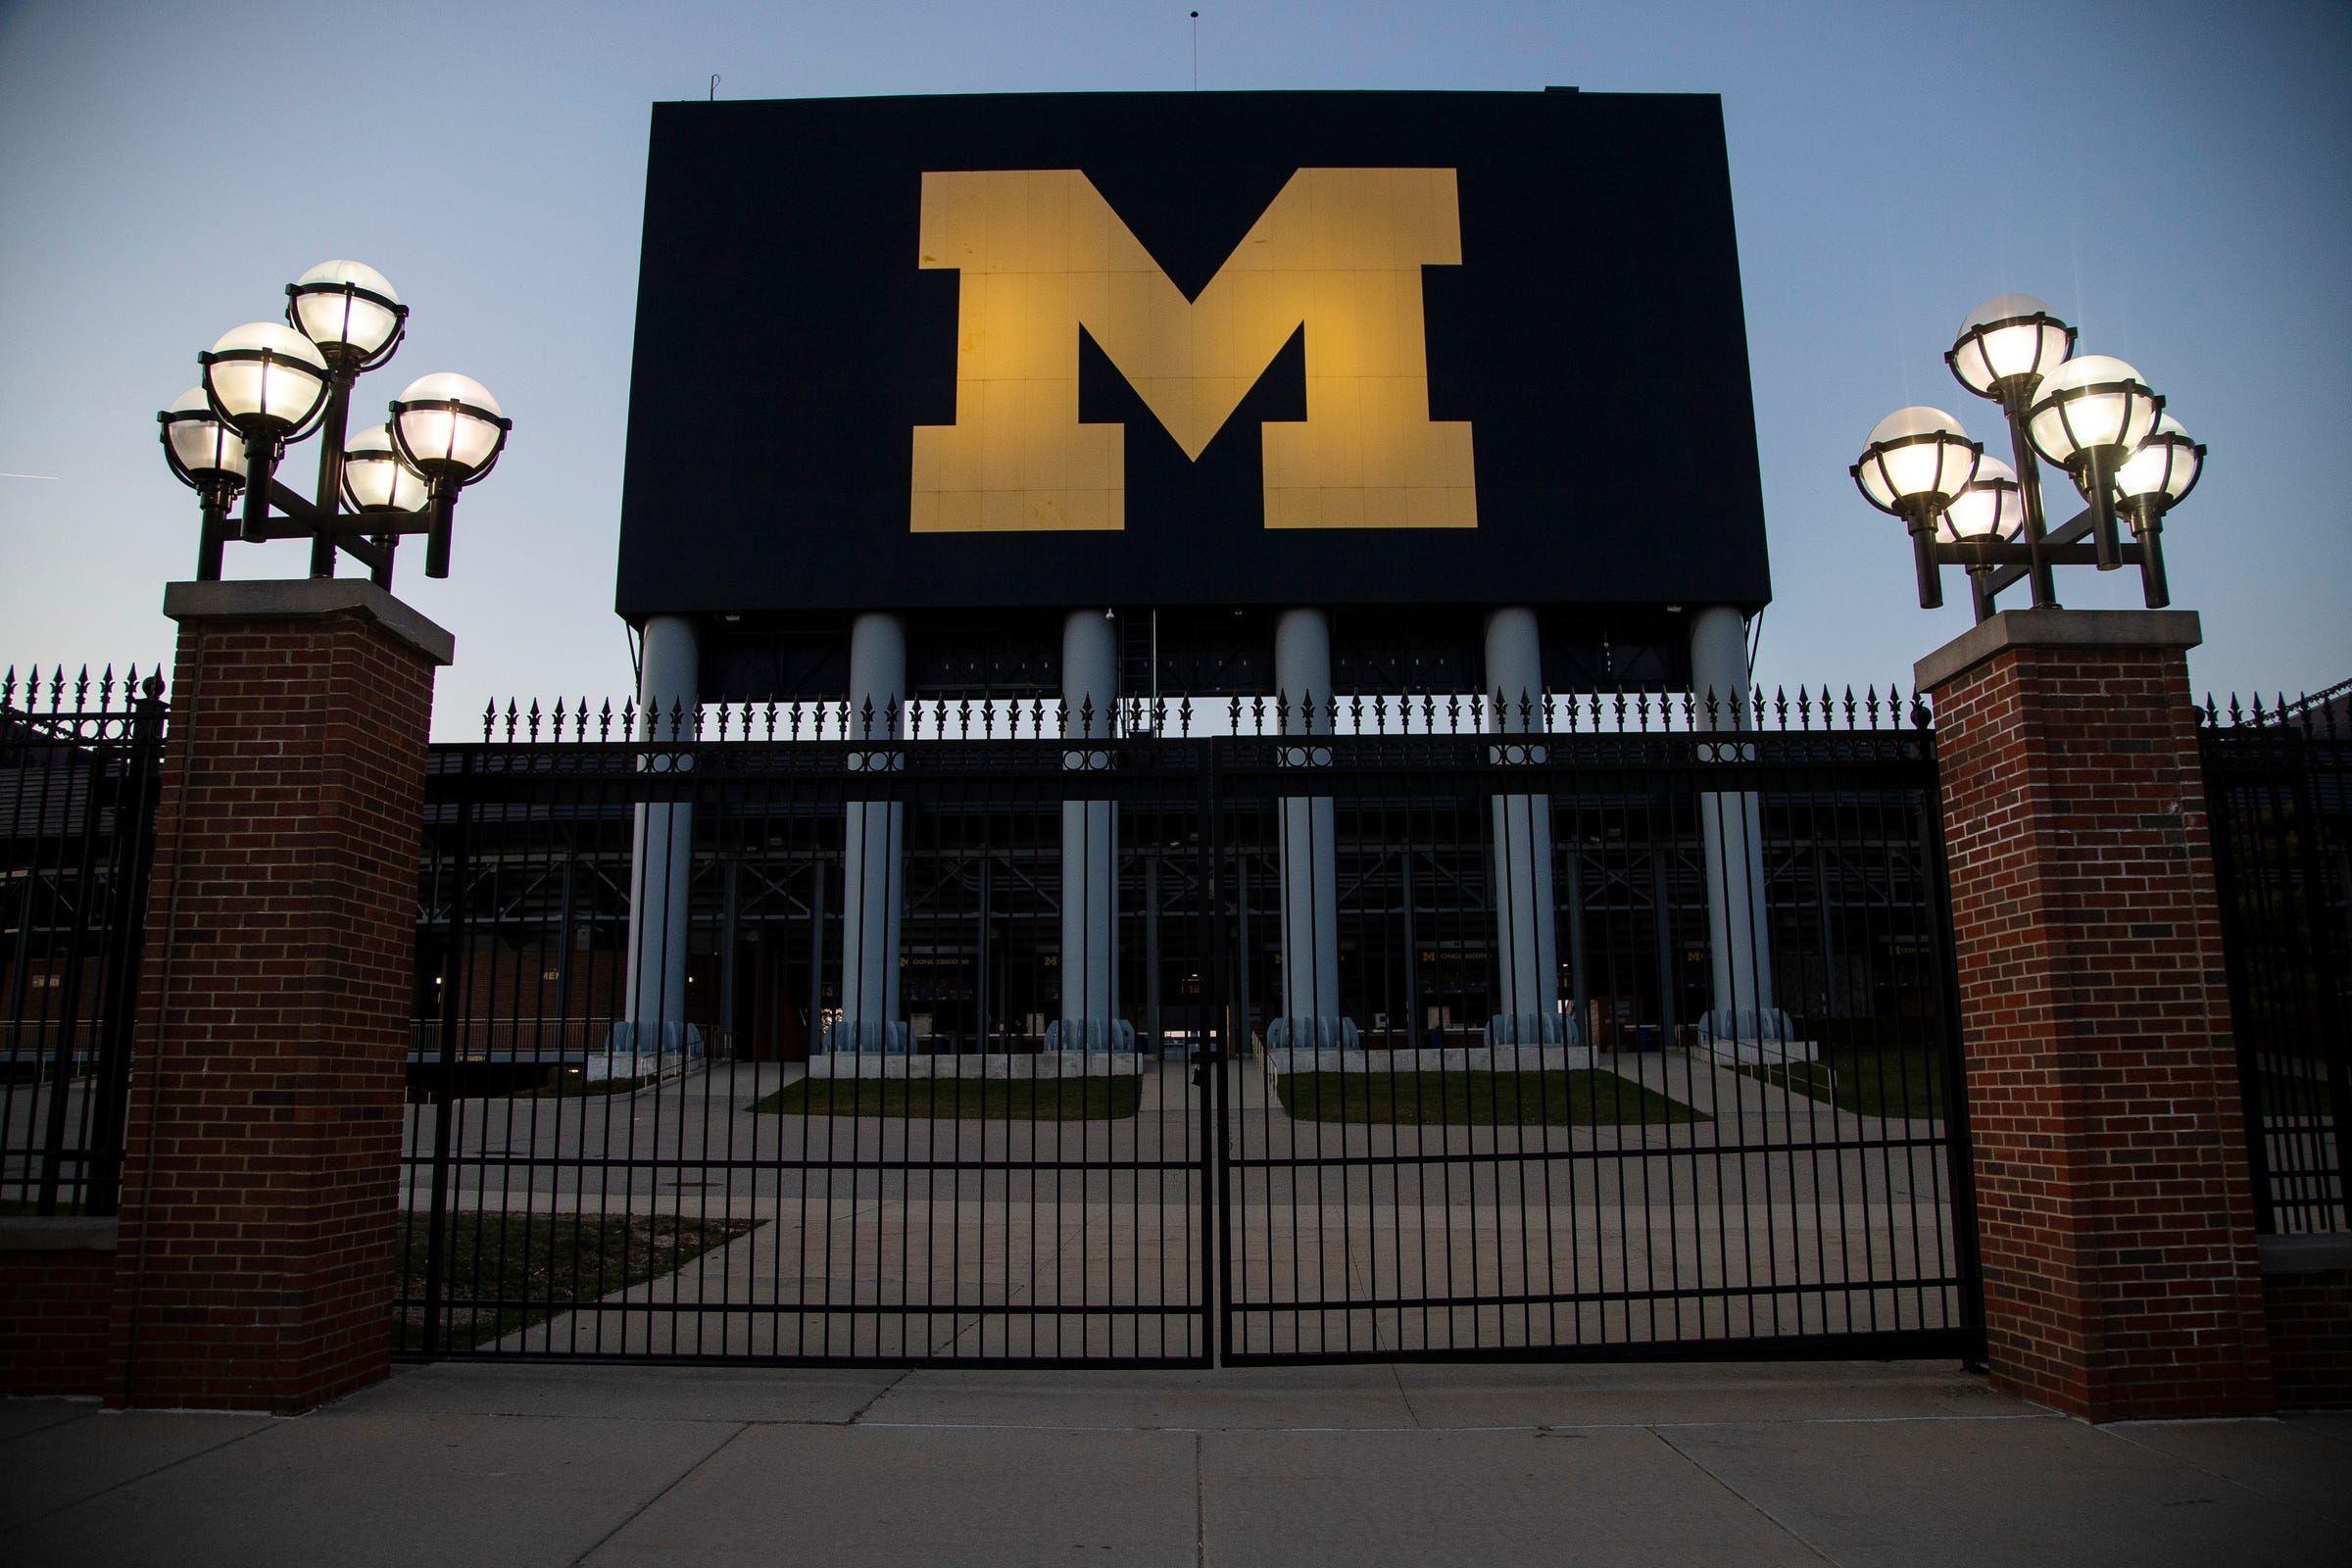 Michigan's athletic department will refund season ticket